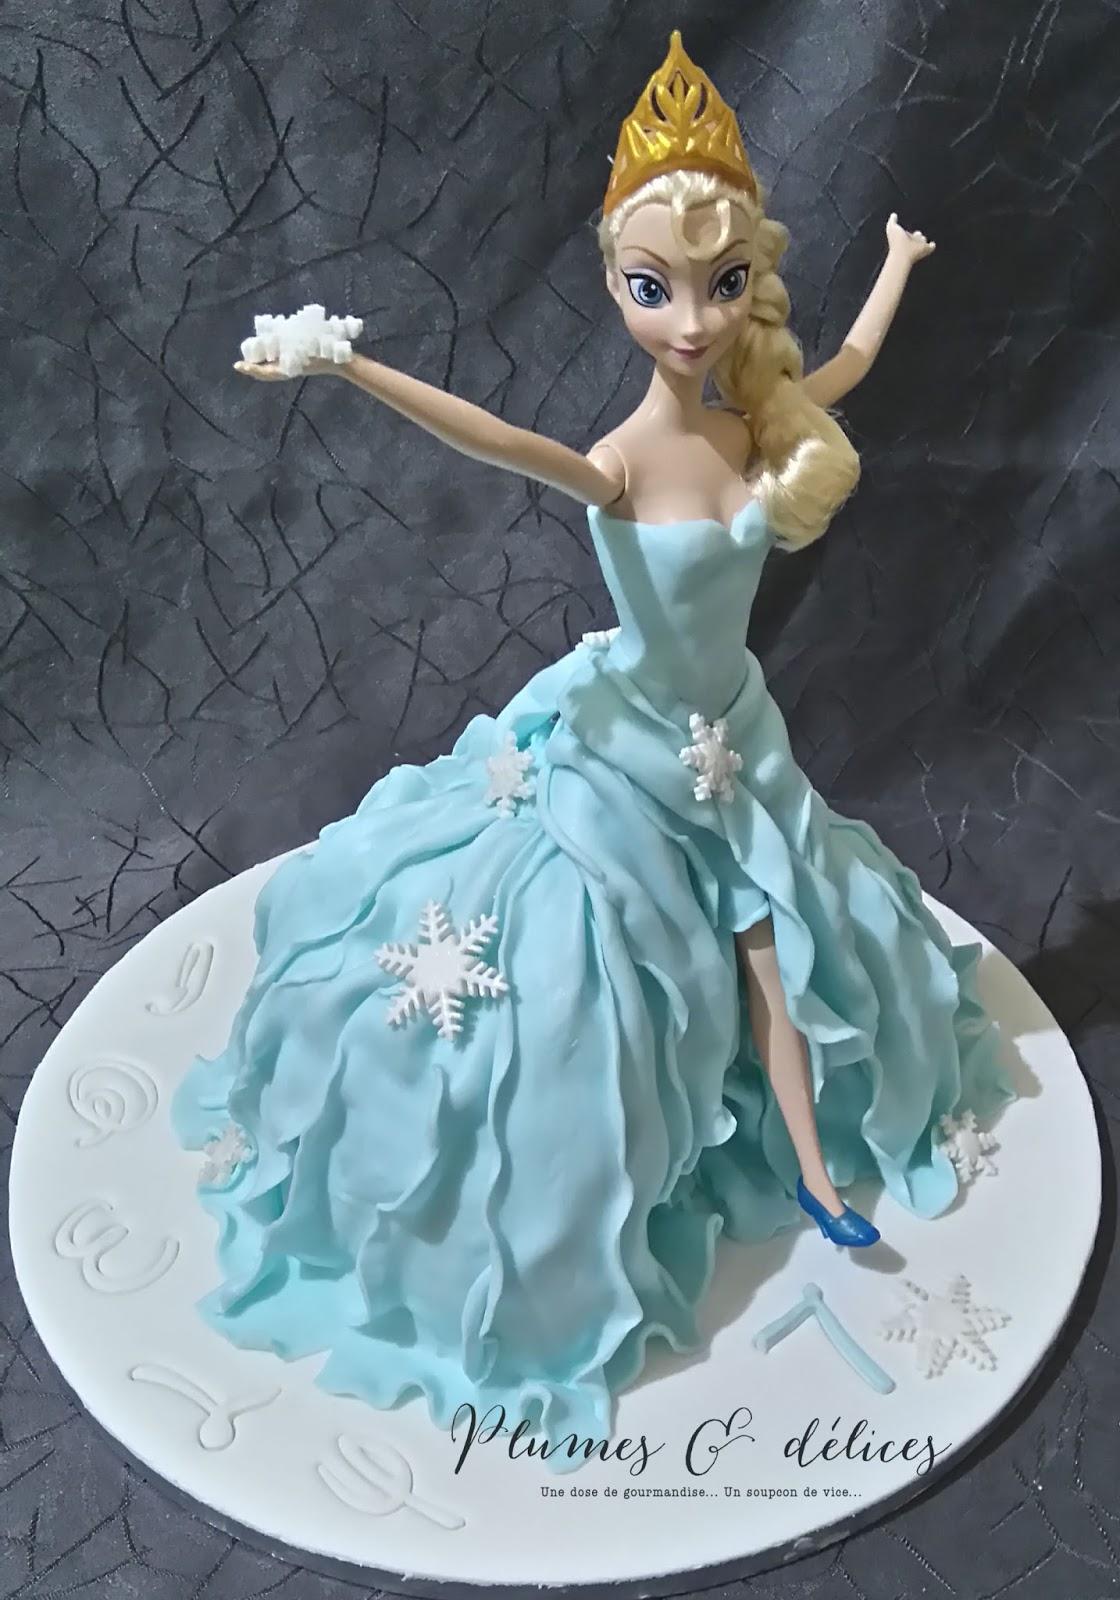 Plumes d lices g teau reine des neiges robe - Robe reine de neige ...